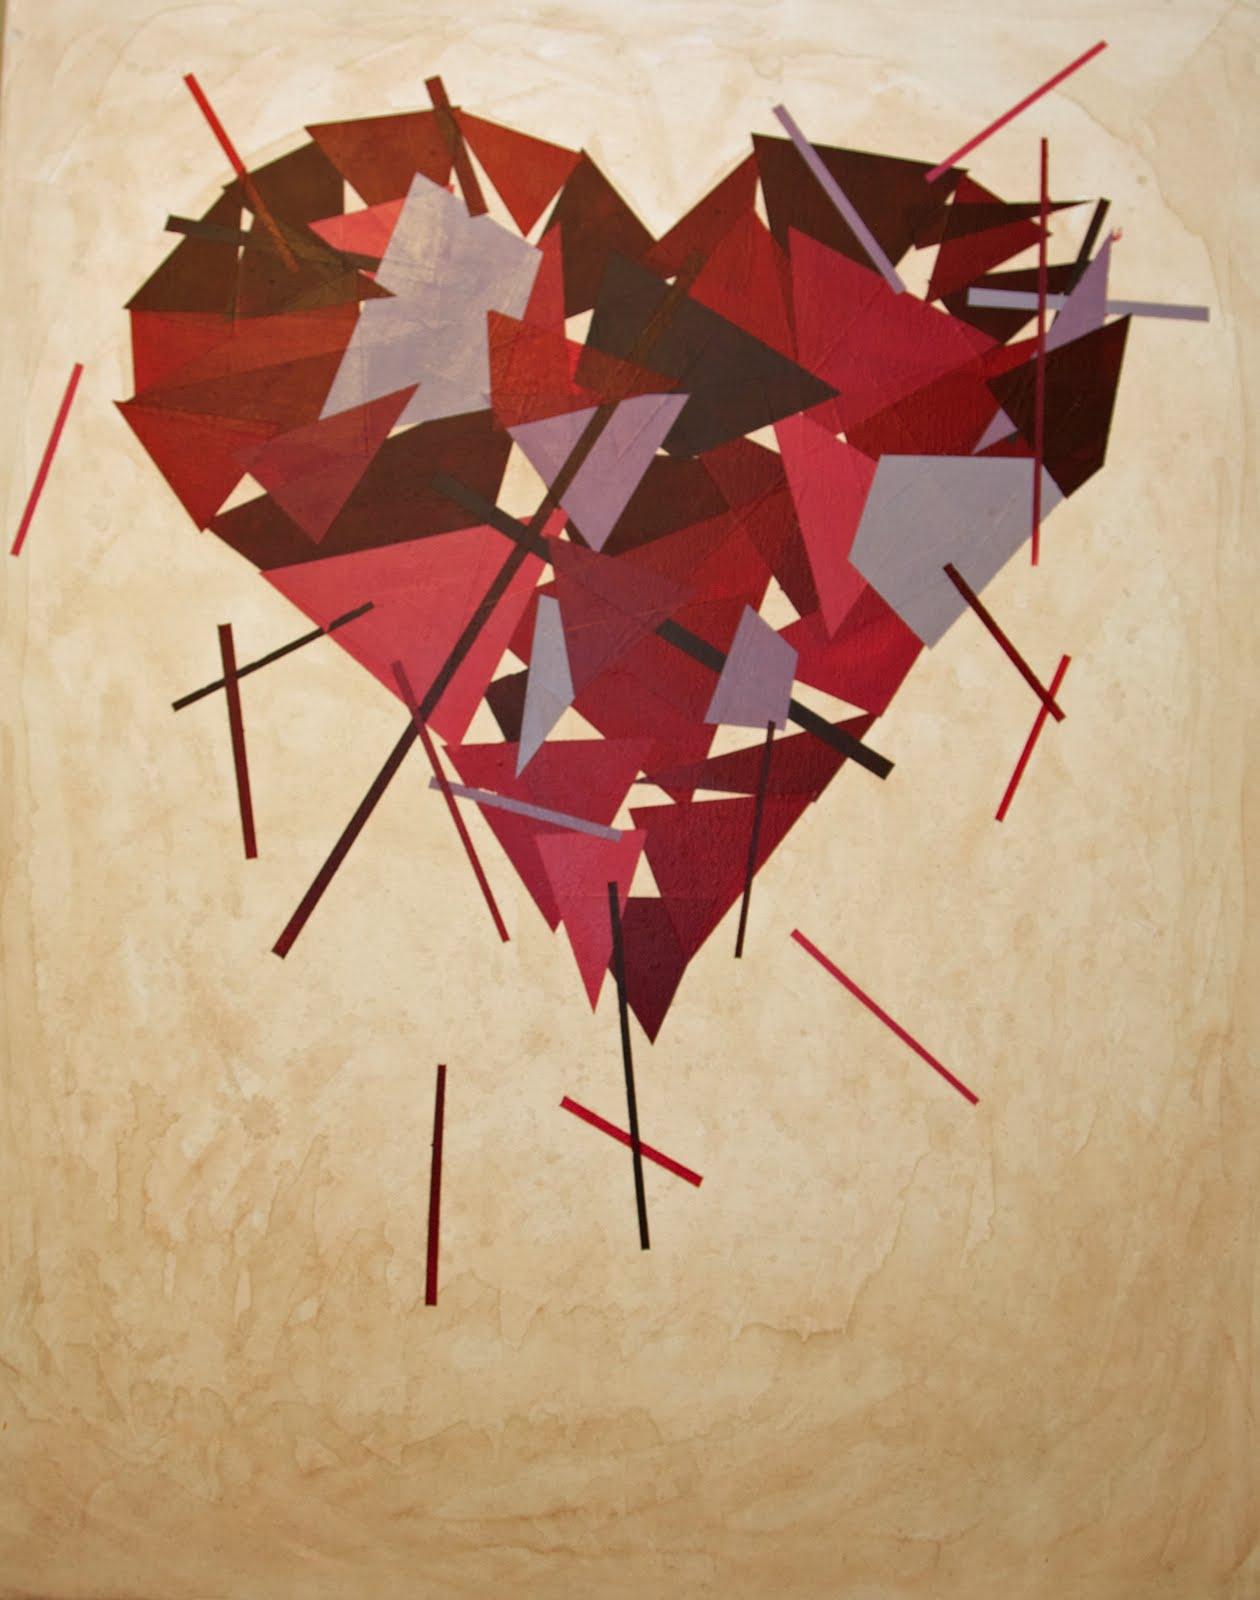 Abstract Human Paintings Abstract Human Heart Painting